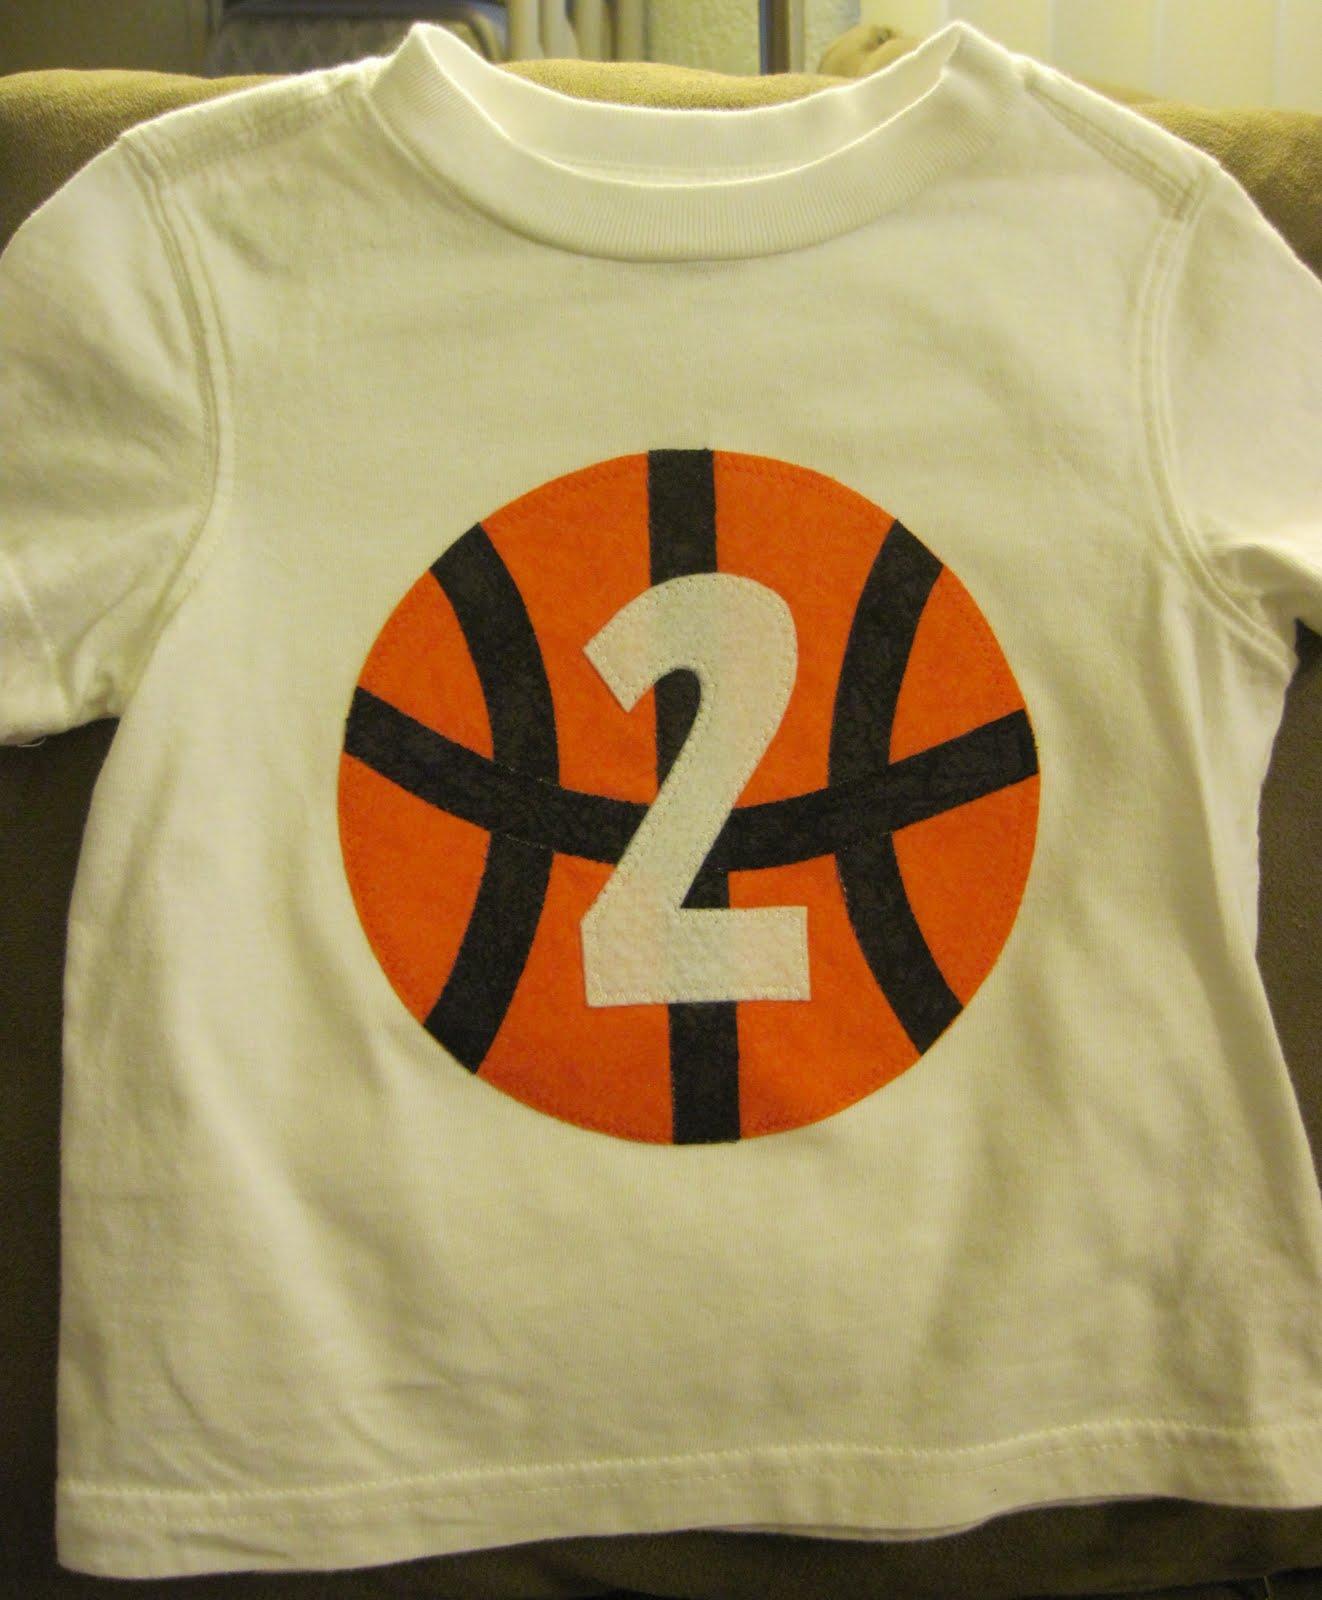 We luv 2 craft applique t shirt for Applique shirts for sale